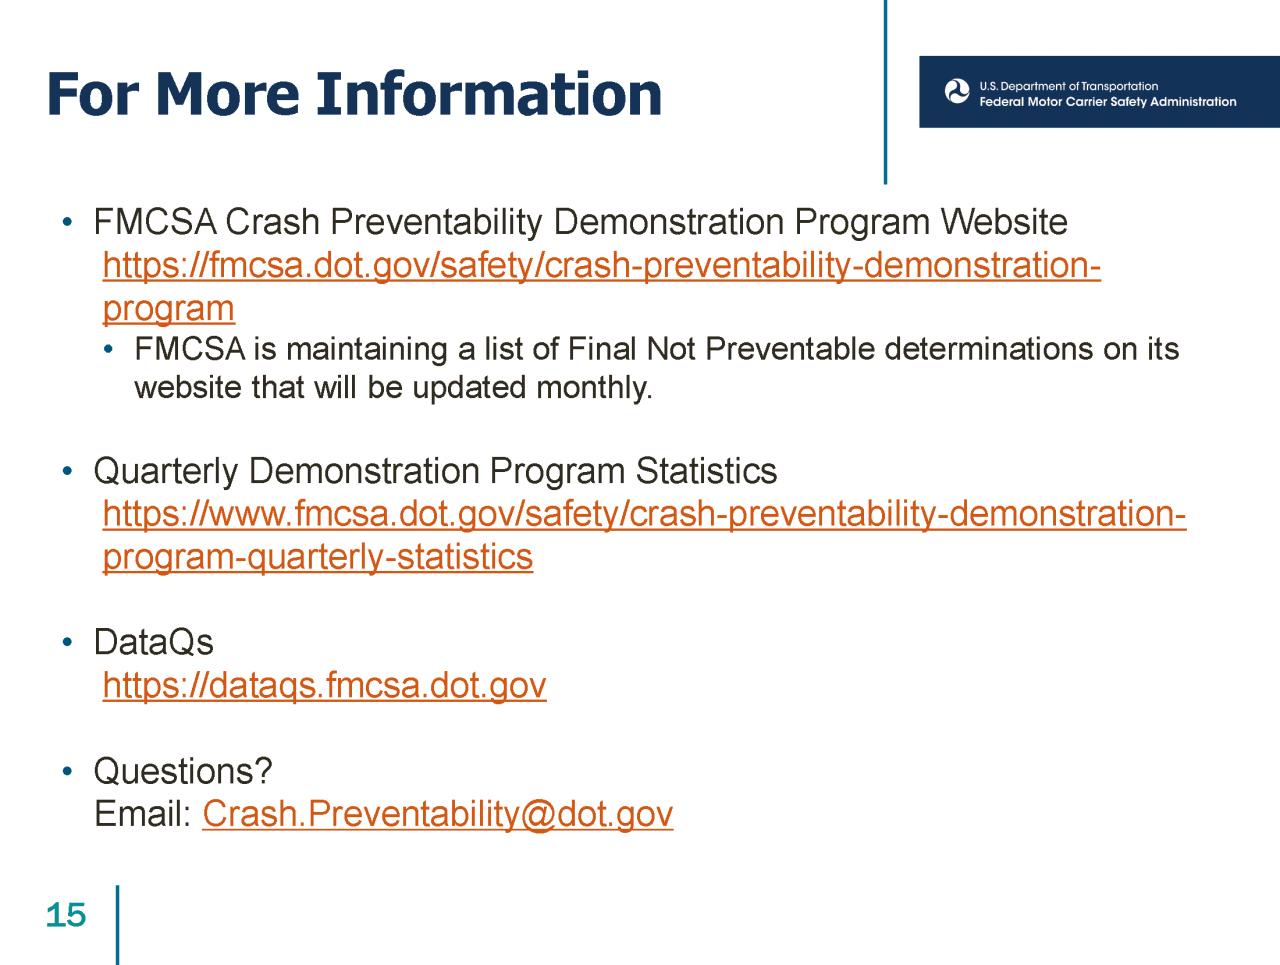 Crash Preventability Demonstration Program Presentation